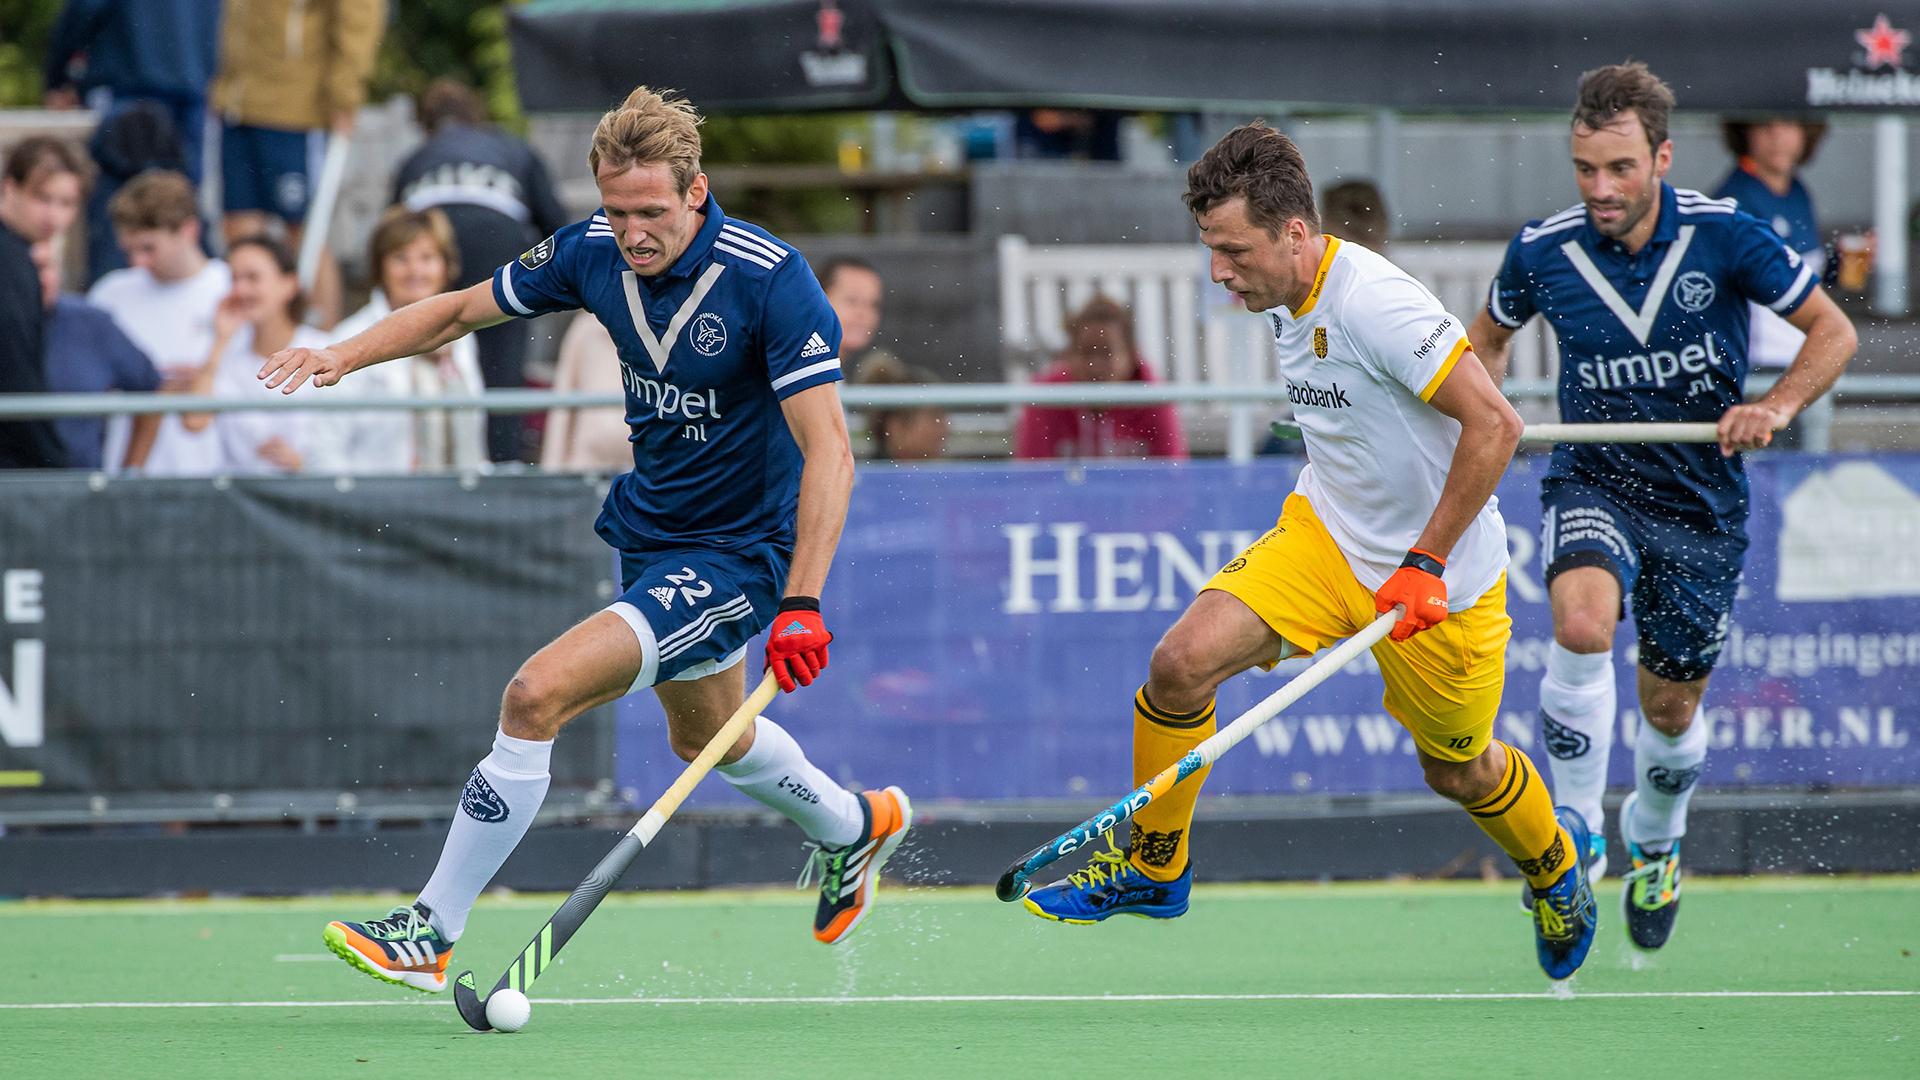 Niklas Wellen Gijs Campbell Pinok%C3%A9 Den Bosch Koen Suyk